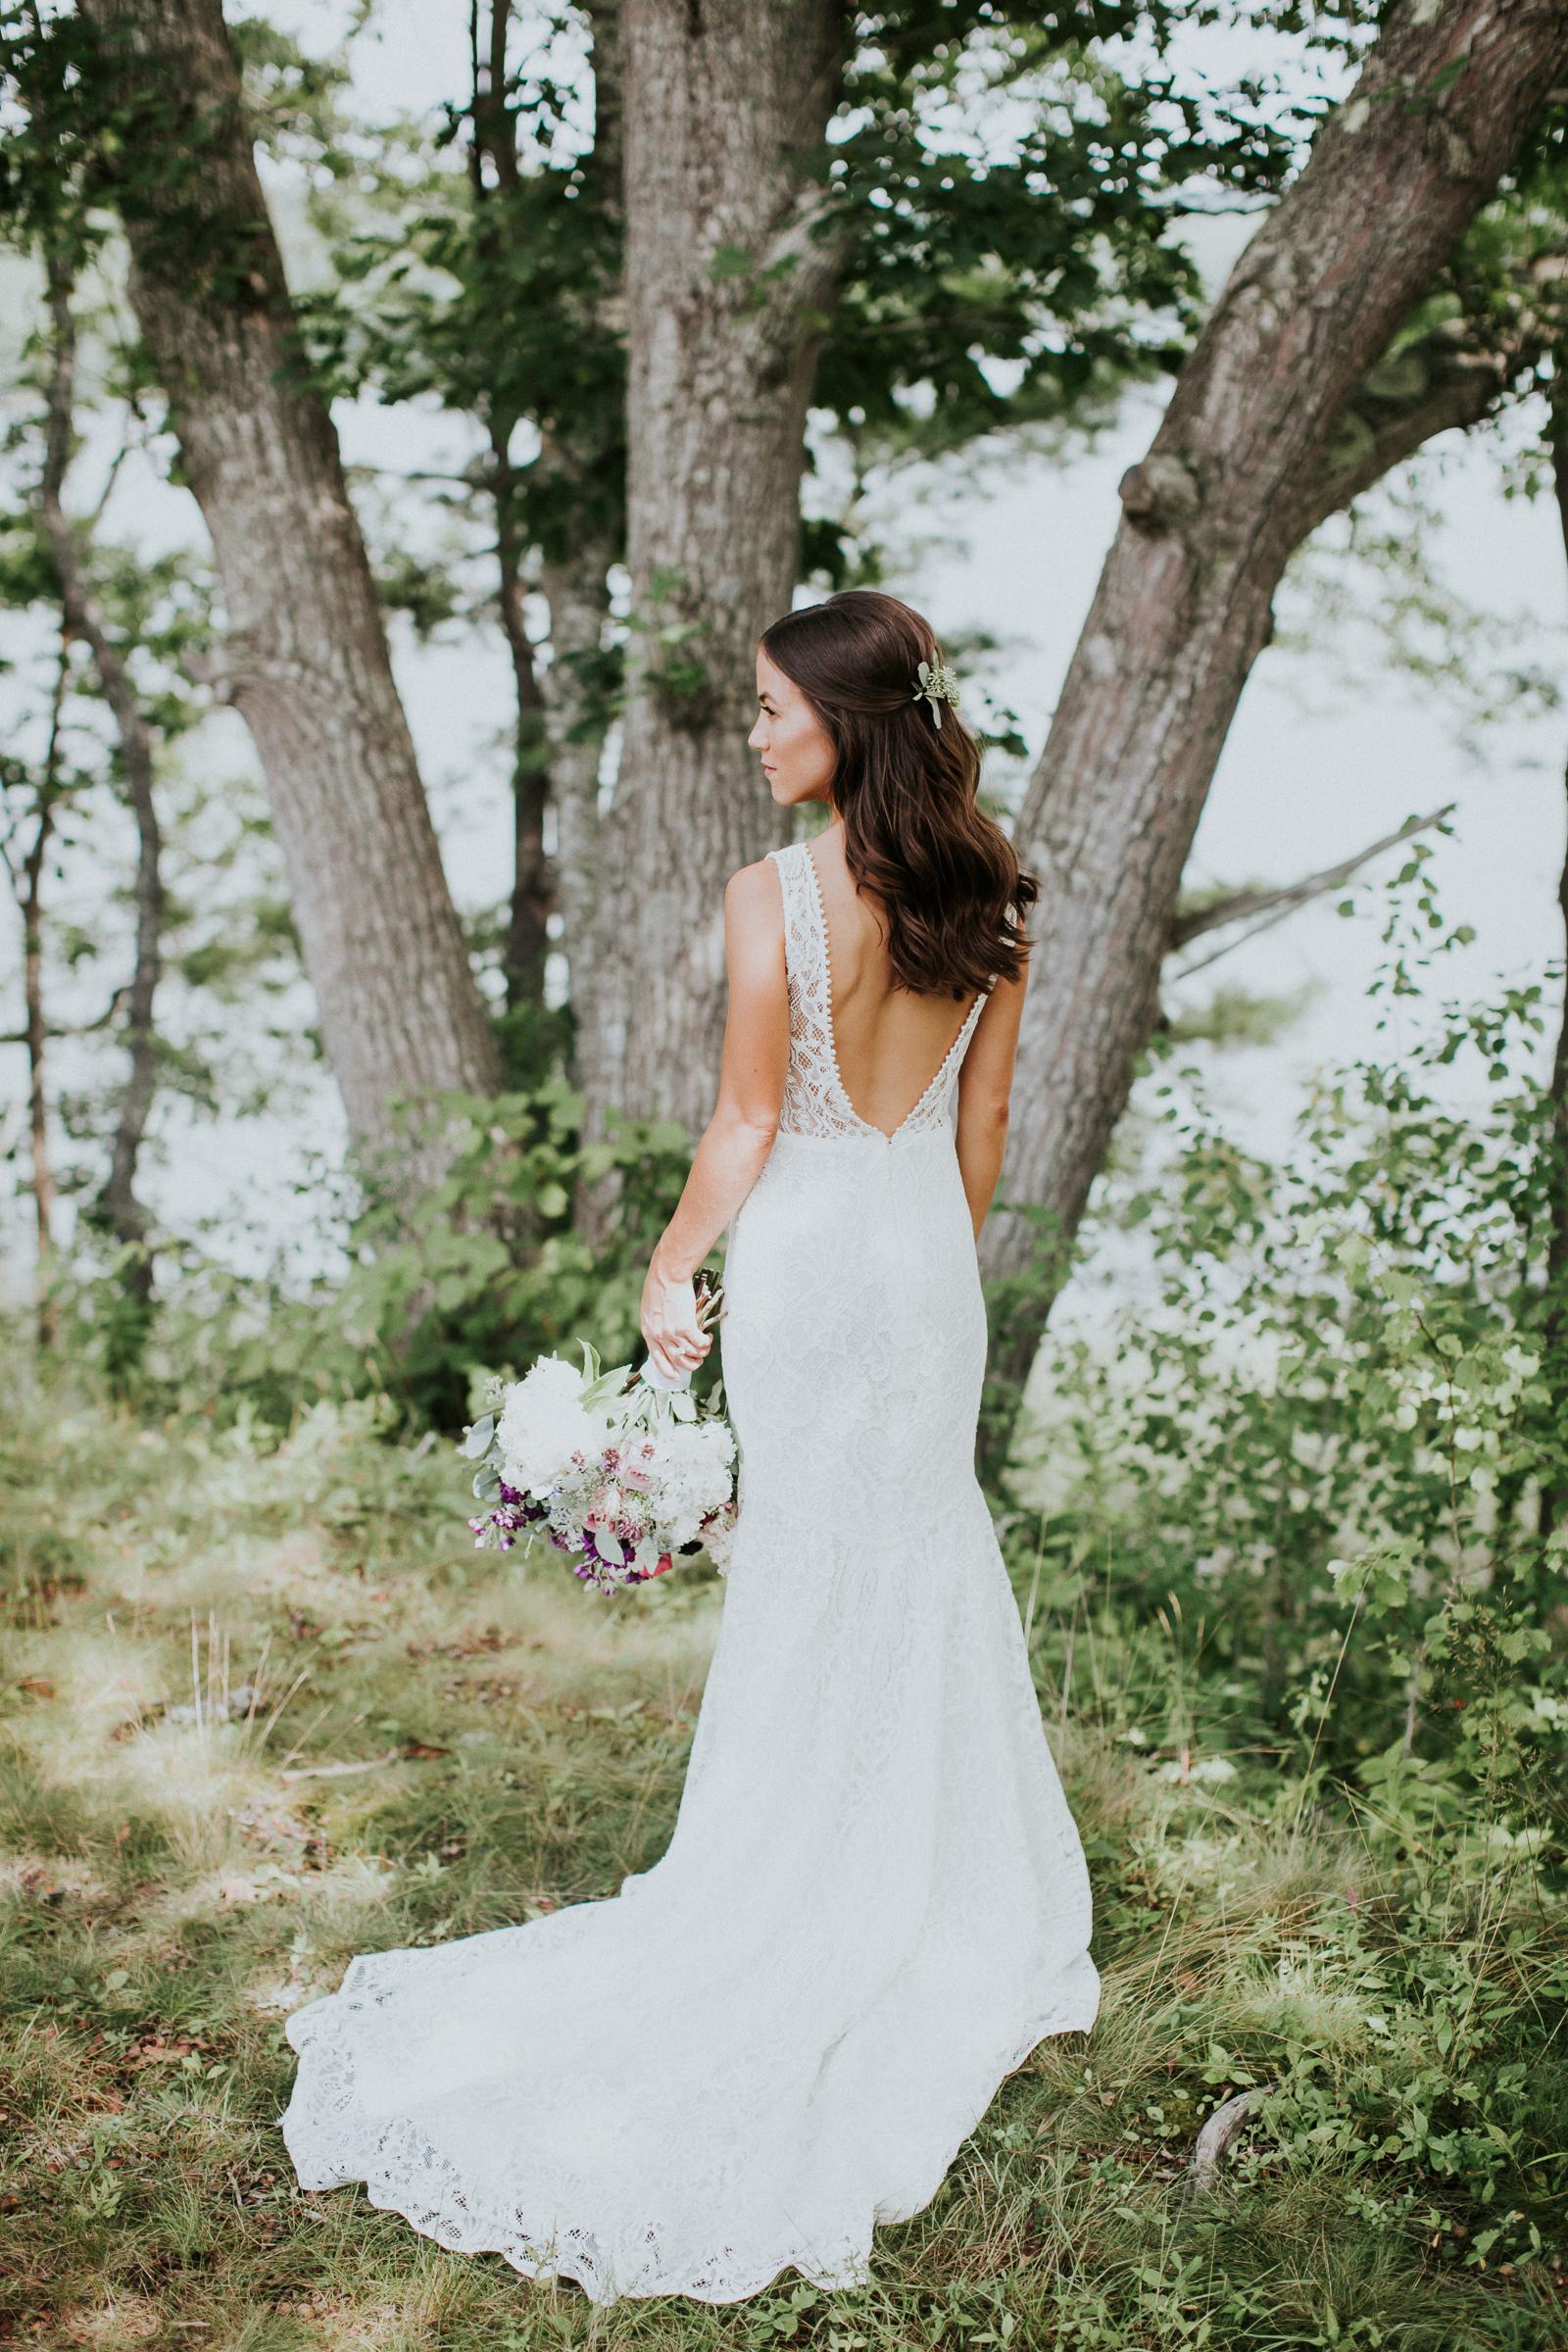 New-York-Documentary-Wedding-Photography-Best-Of-2017-by-Elvira-Kalviste-Photography-35.jpg